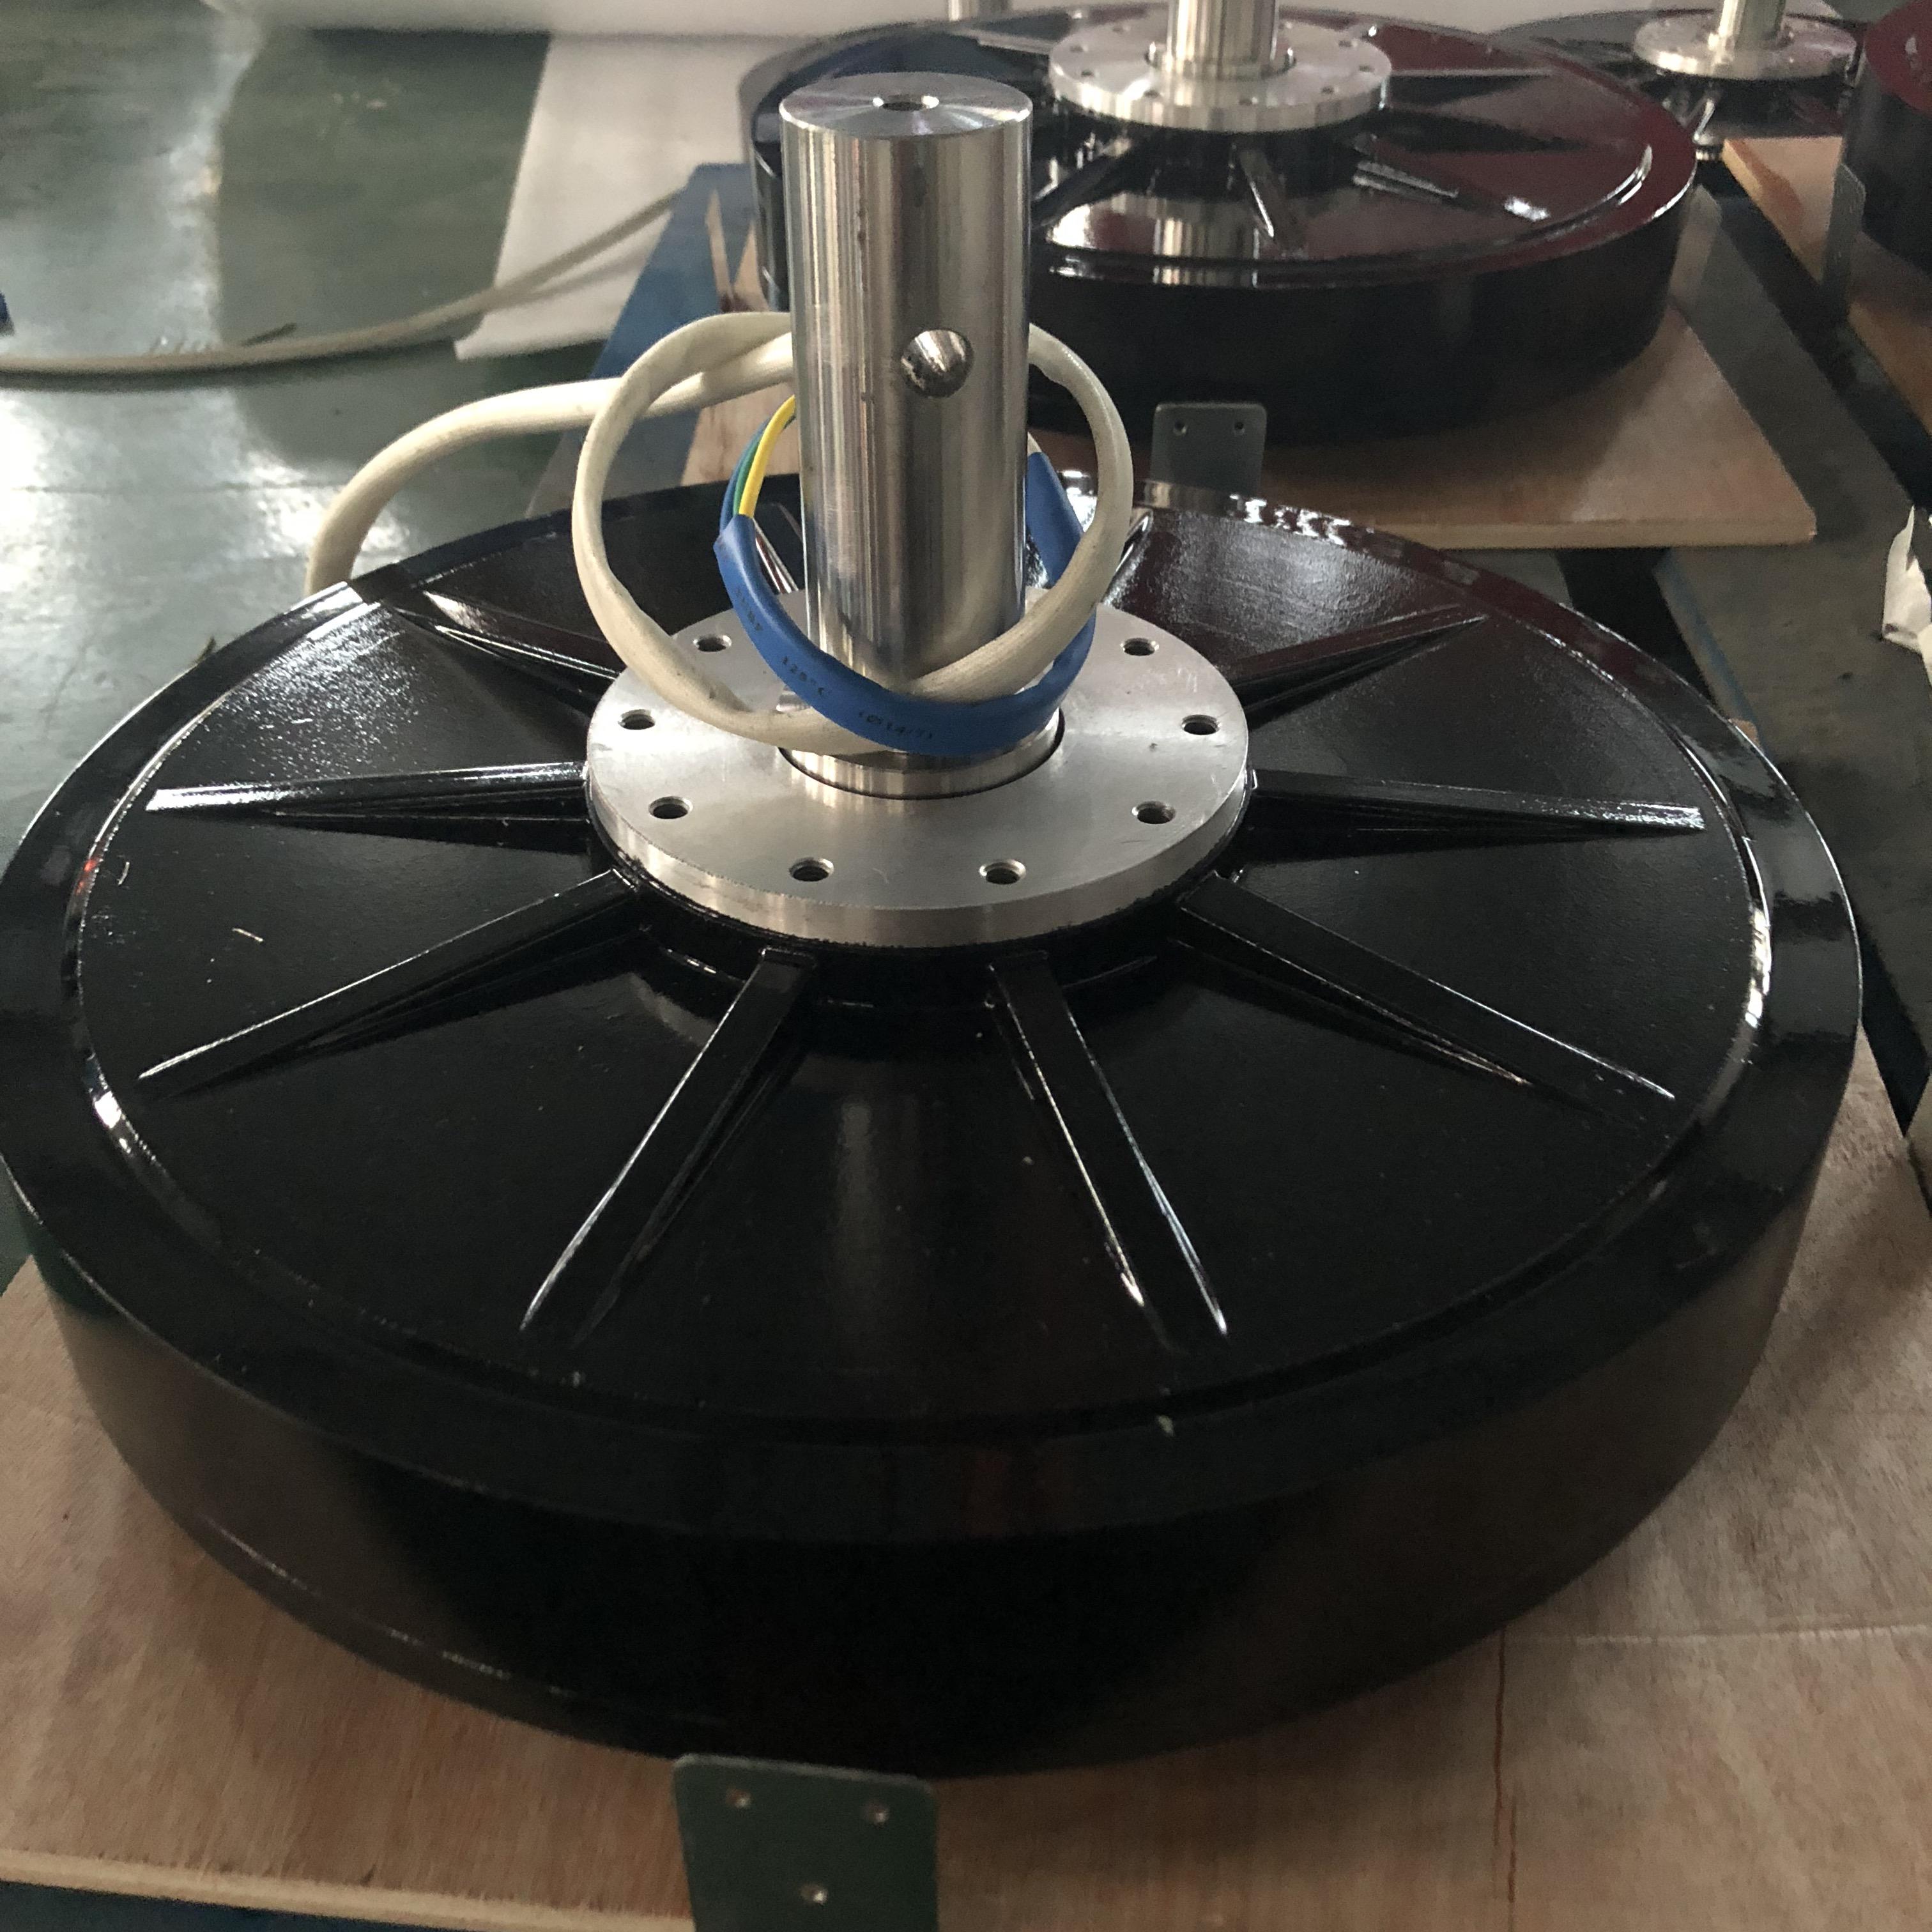 Hiest 0.3kw generator axial flux permanent magnet generator 0.3KW home using wind turbine generator